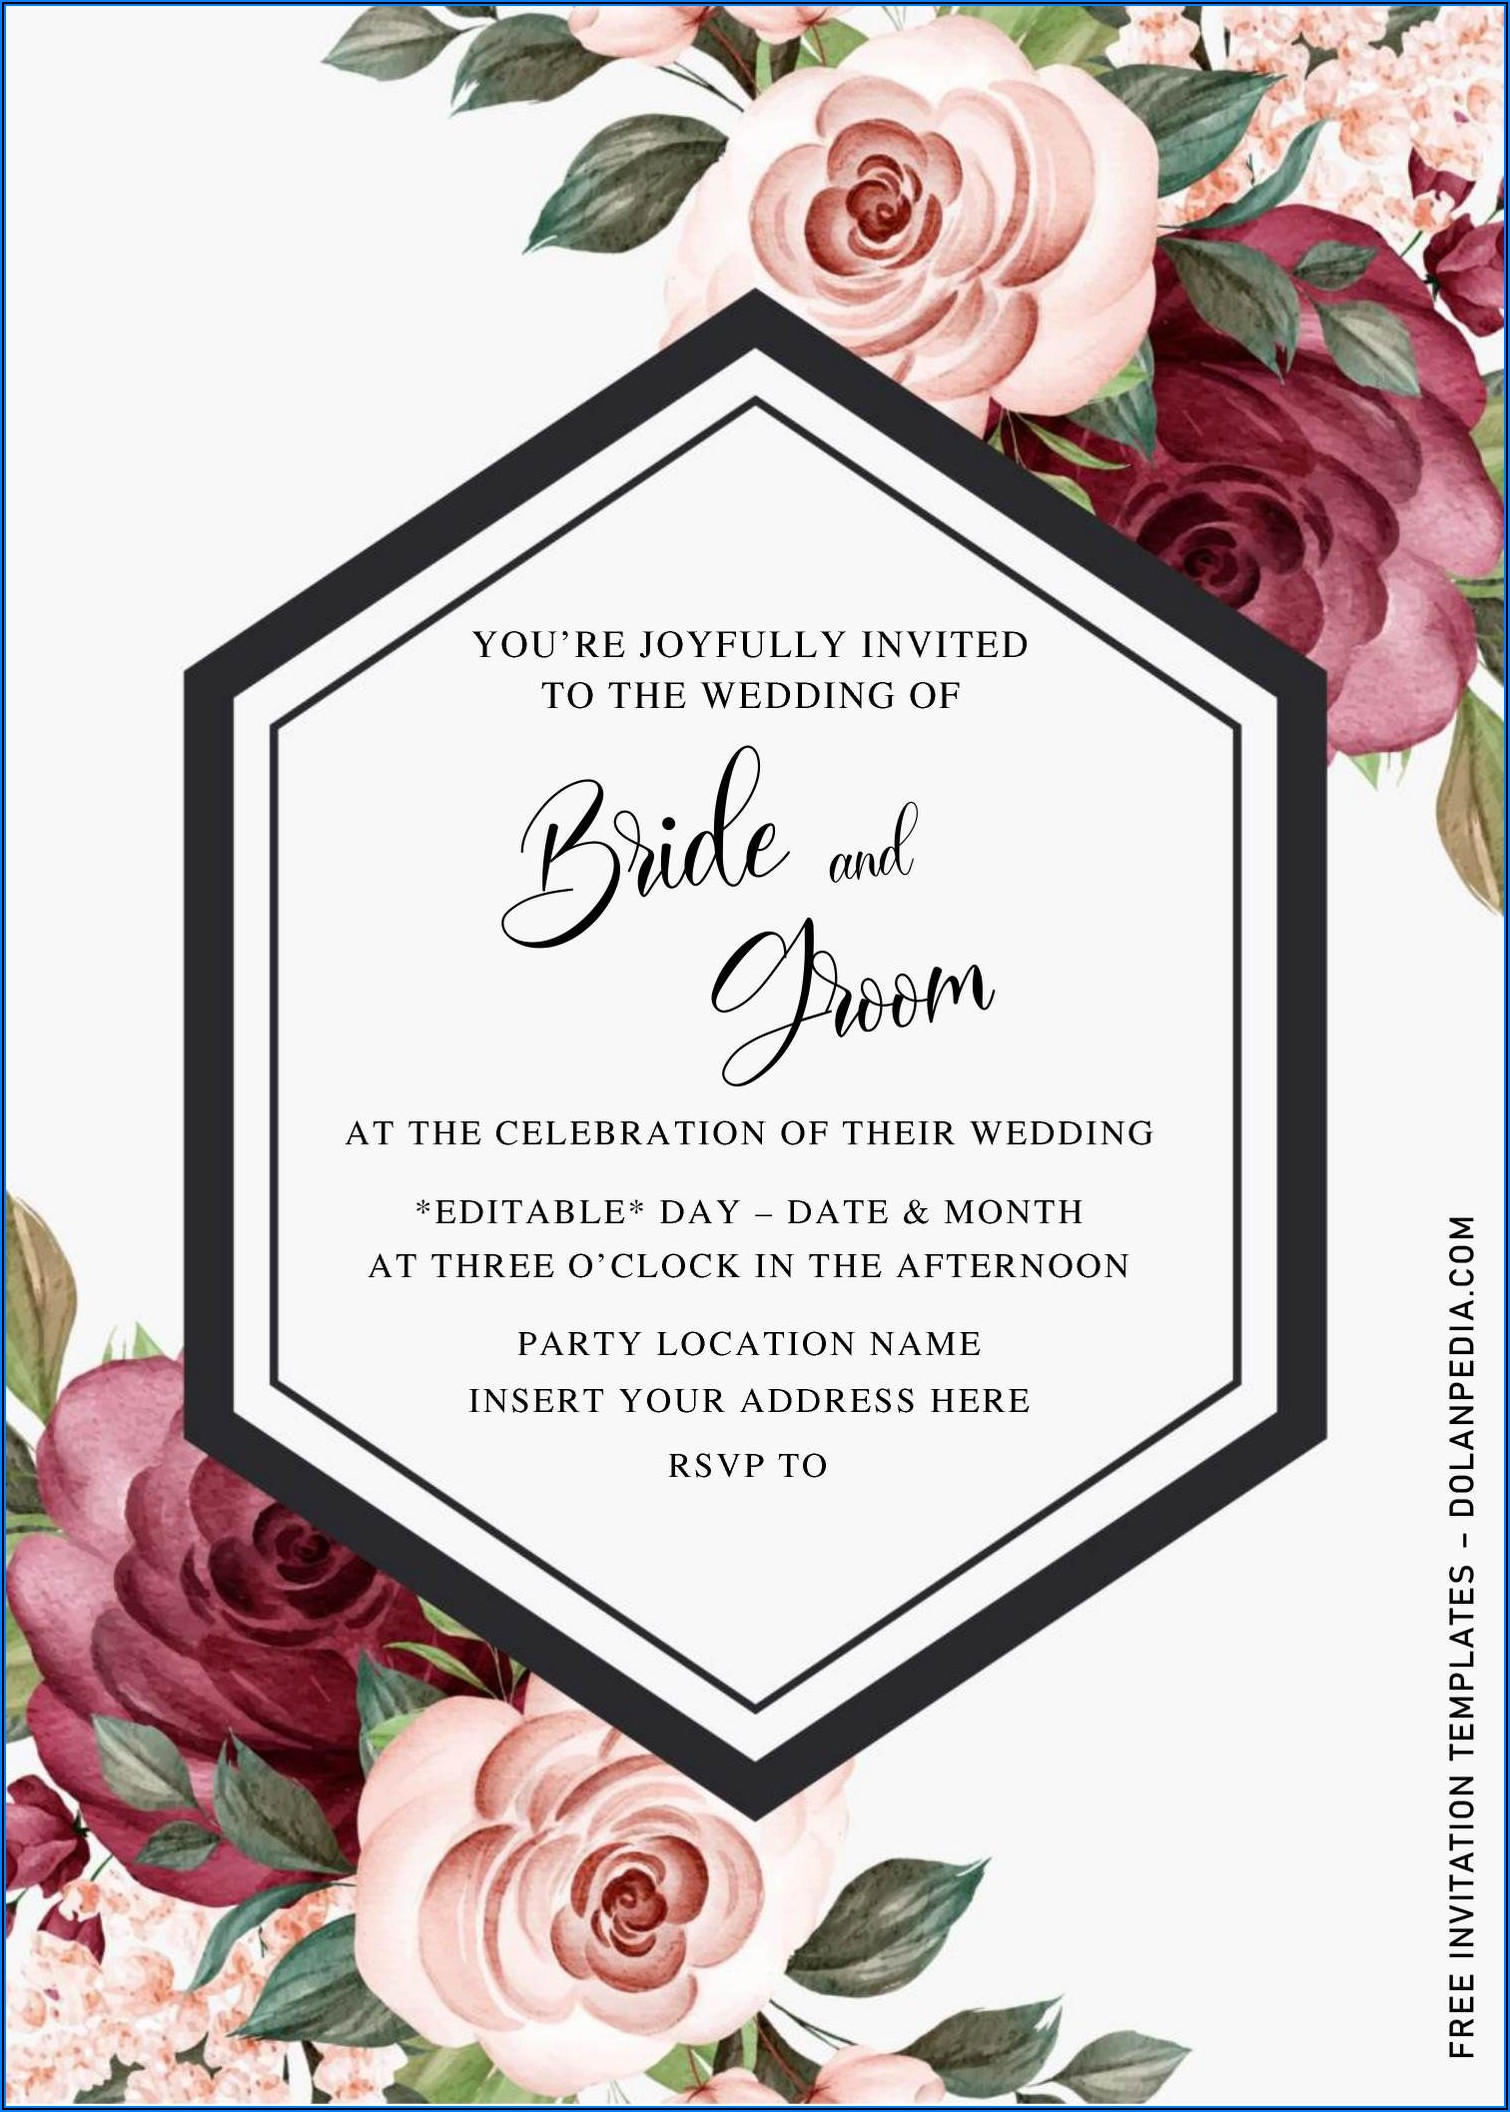 Burgundy Wedding Invitations Templates Free